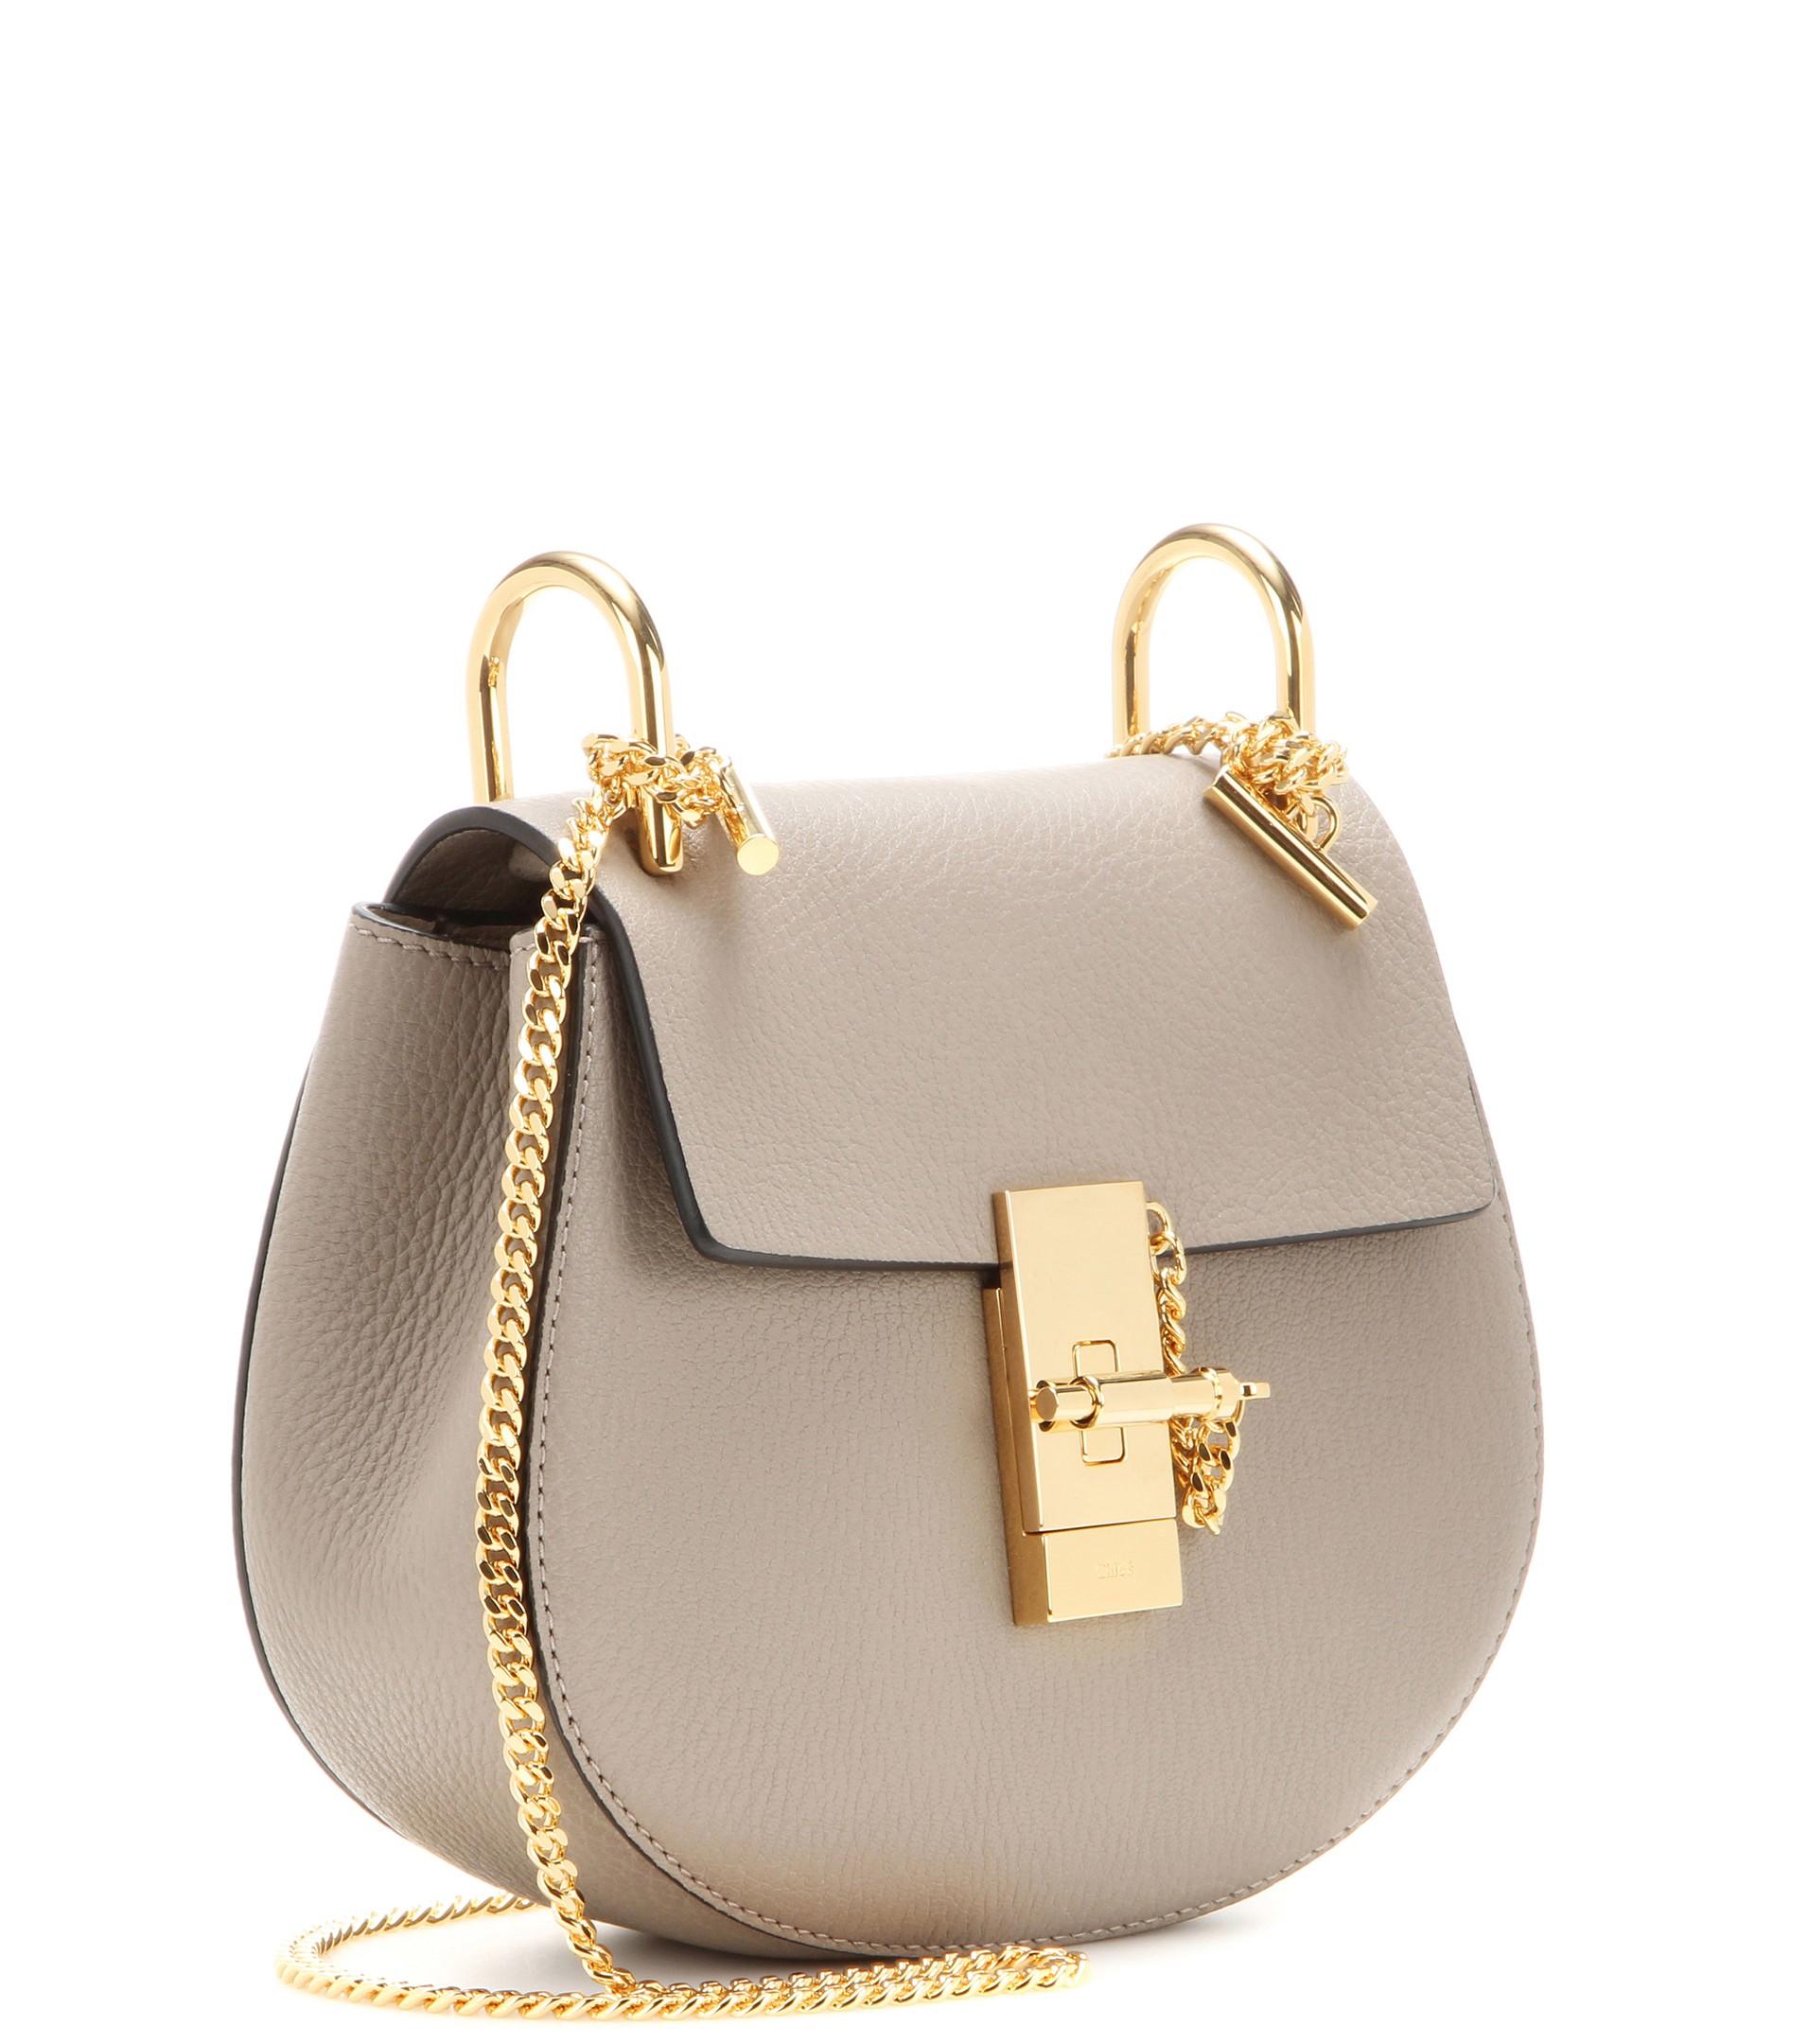 chloe python handbag - Chlo�� Drew Mini Leather Shoulder Bag in Gray (Motty Grey) | Lyst